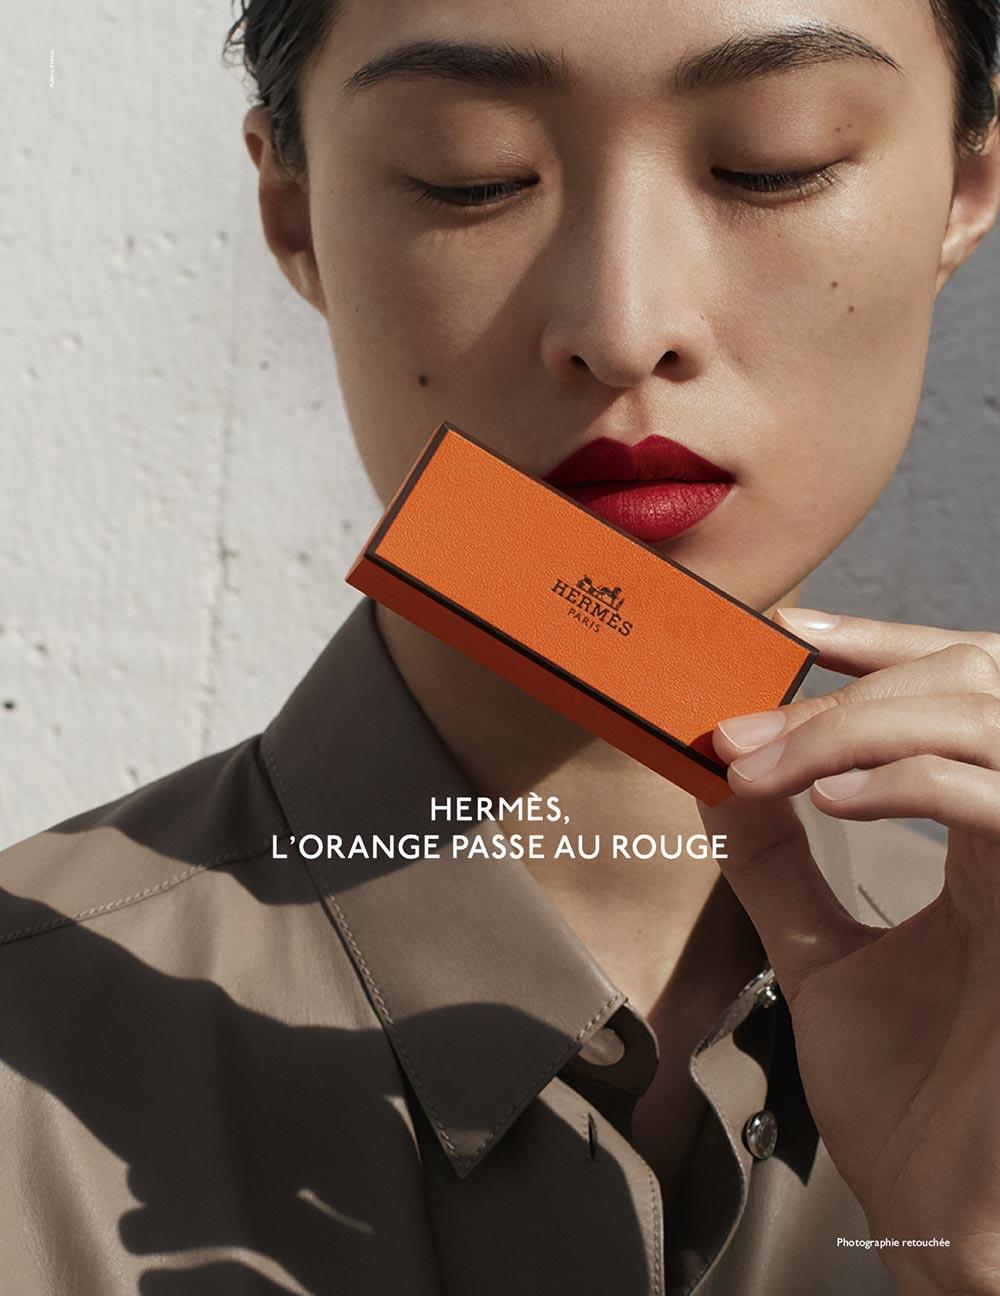 Hermès, l'orange passe au rouge